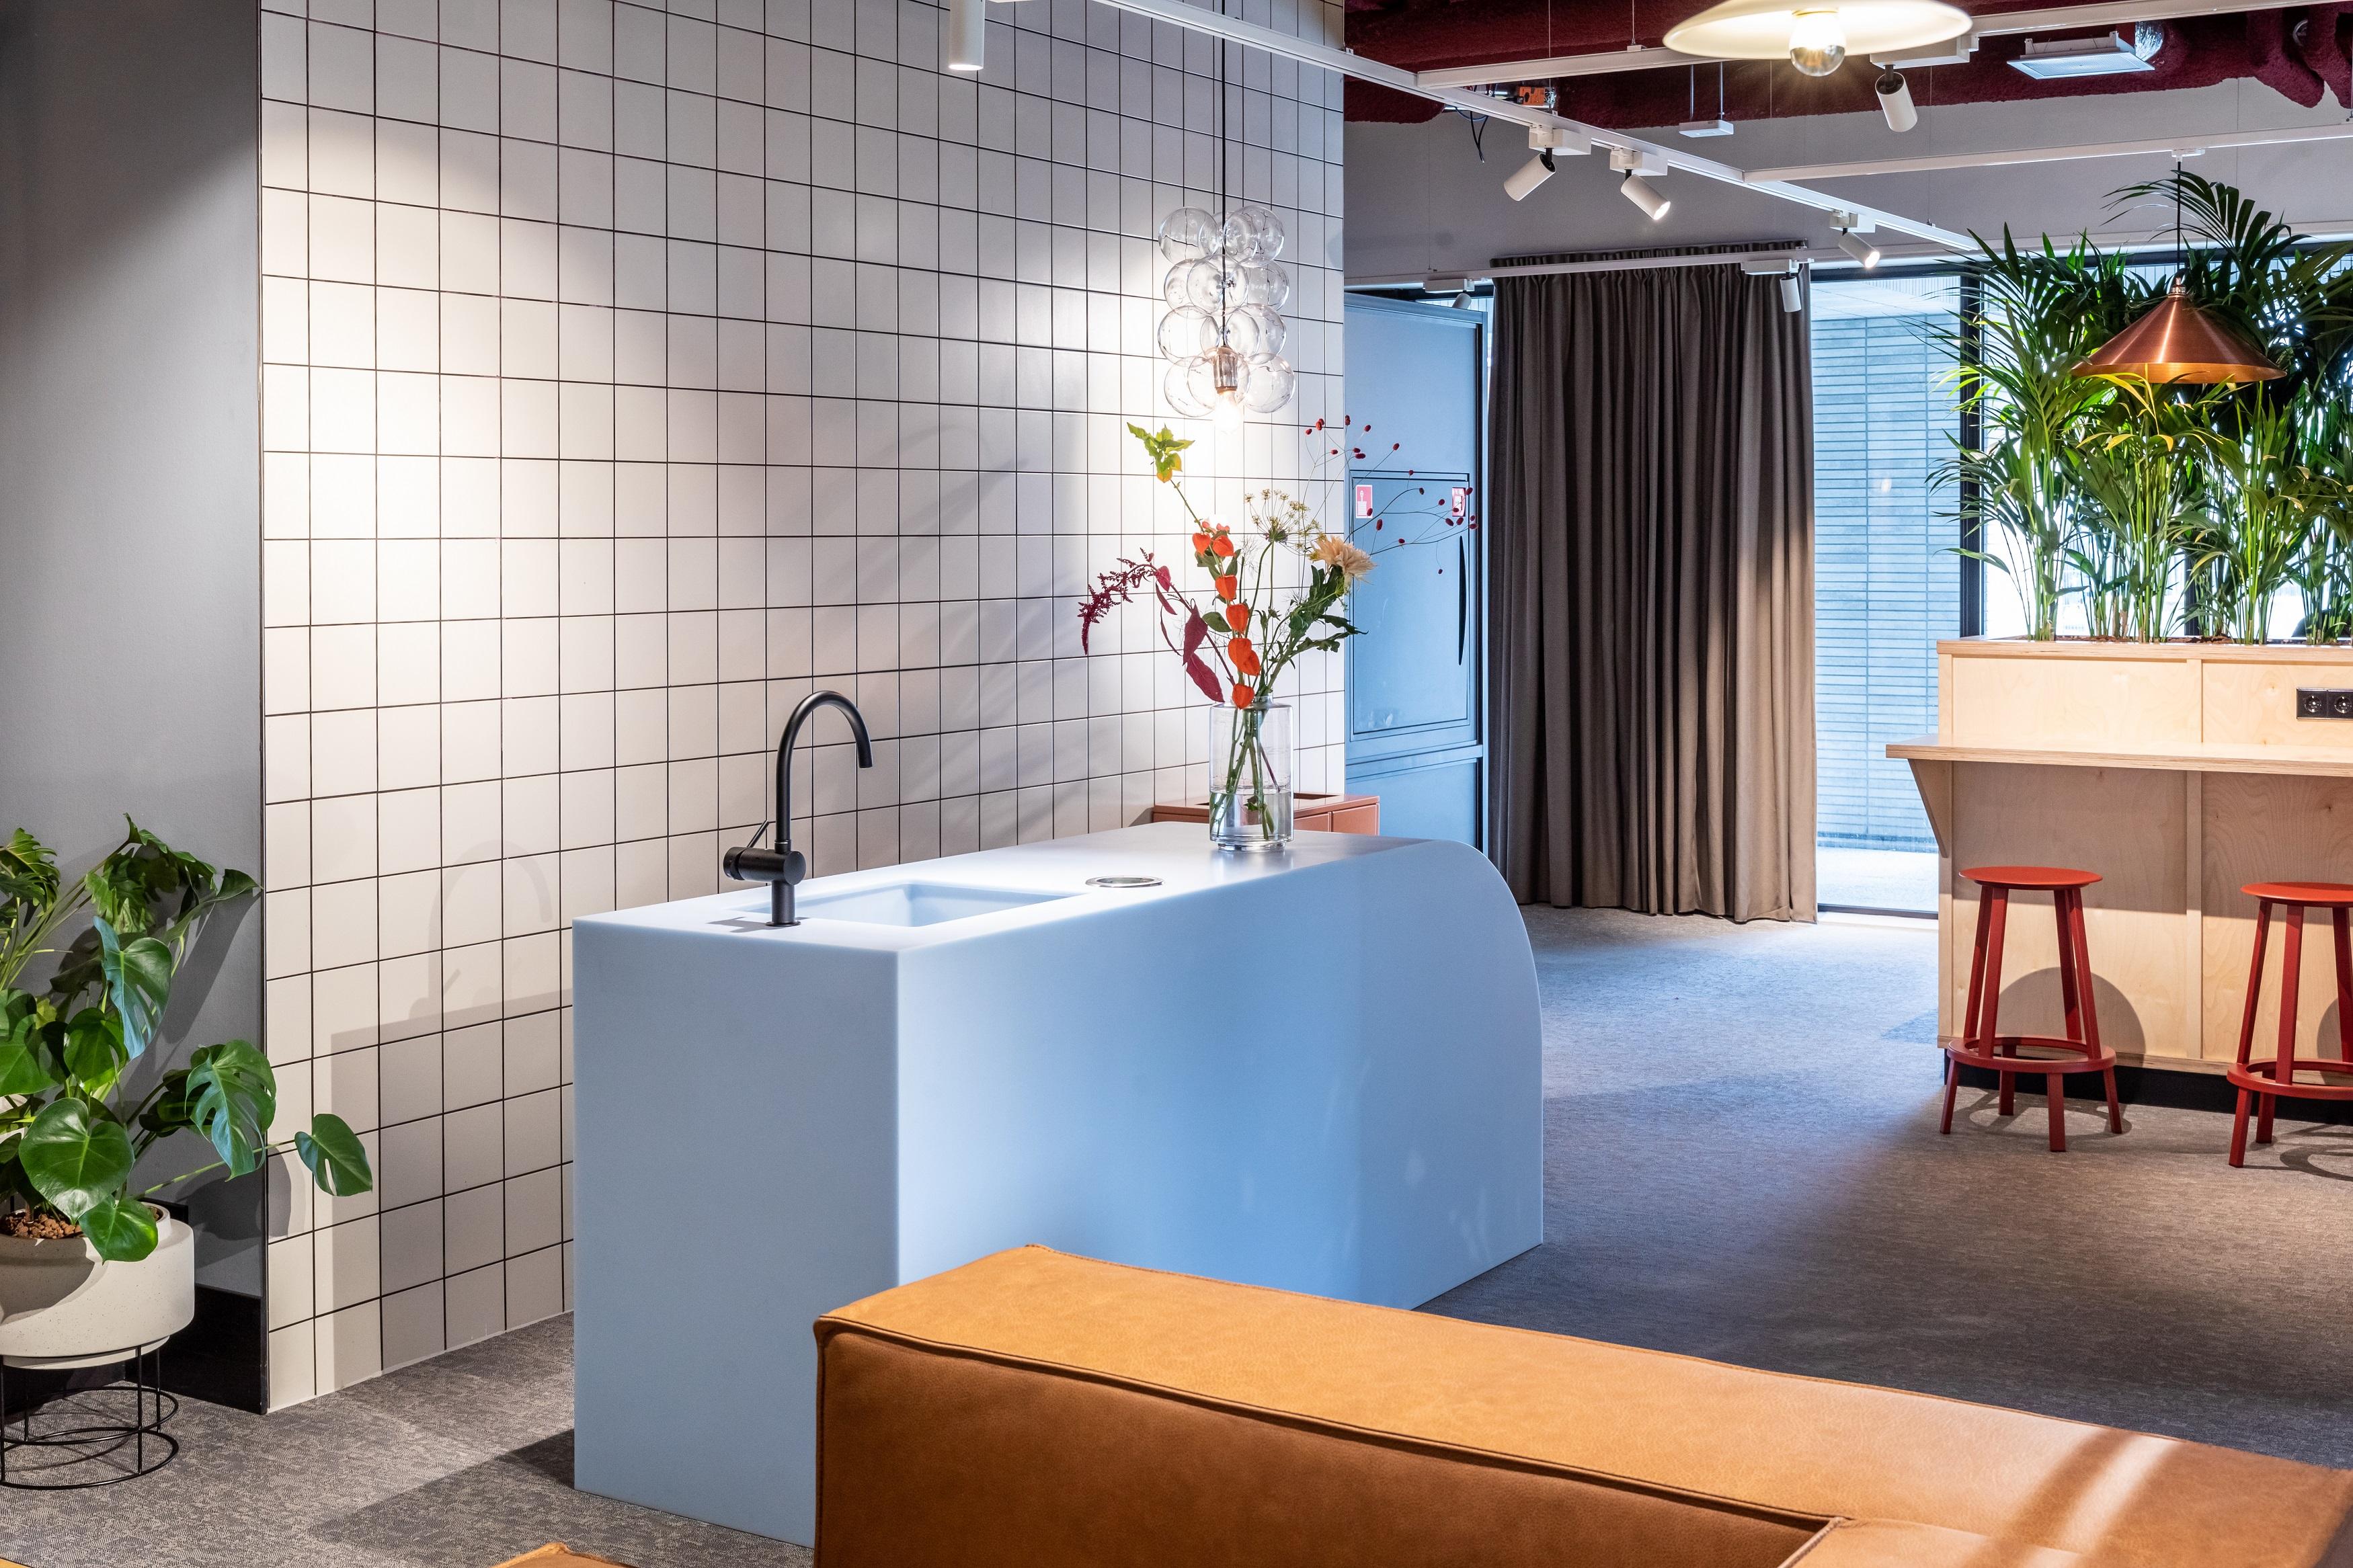 OurDomain Amsterdam Diemen lounge with sink